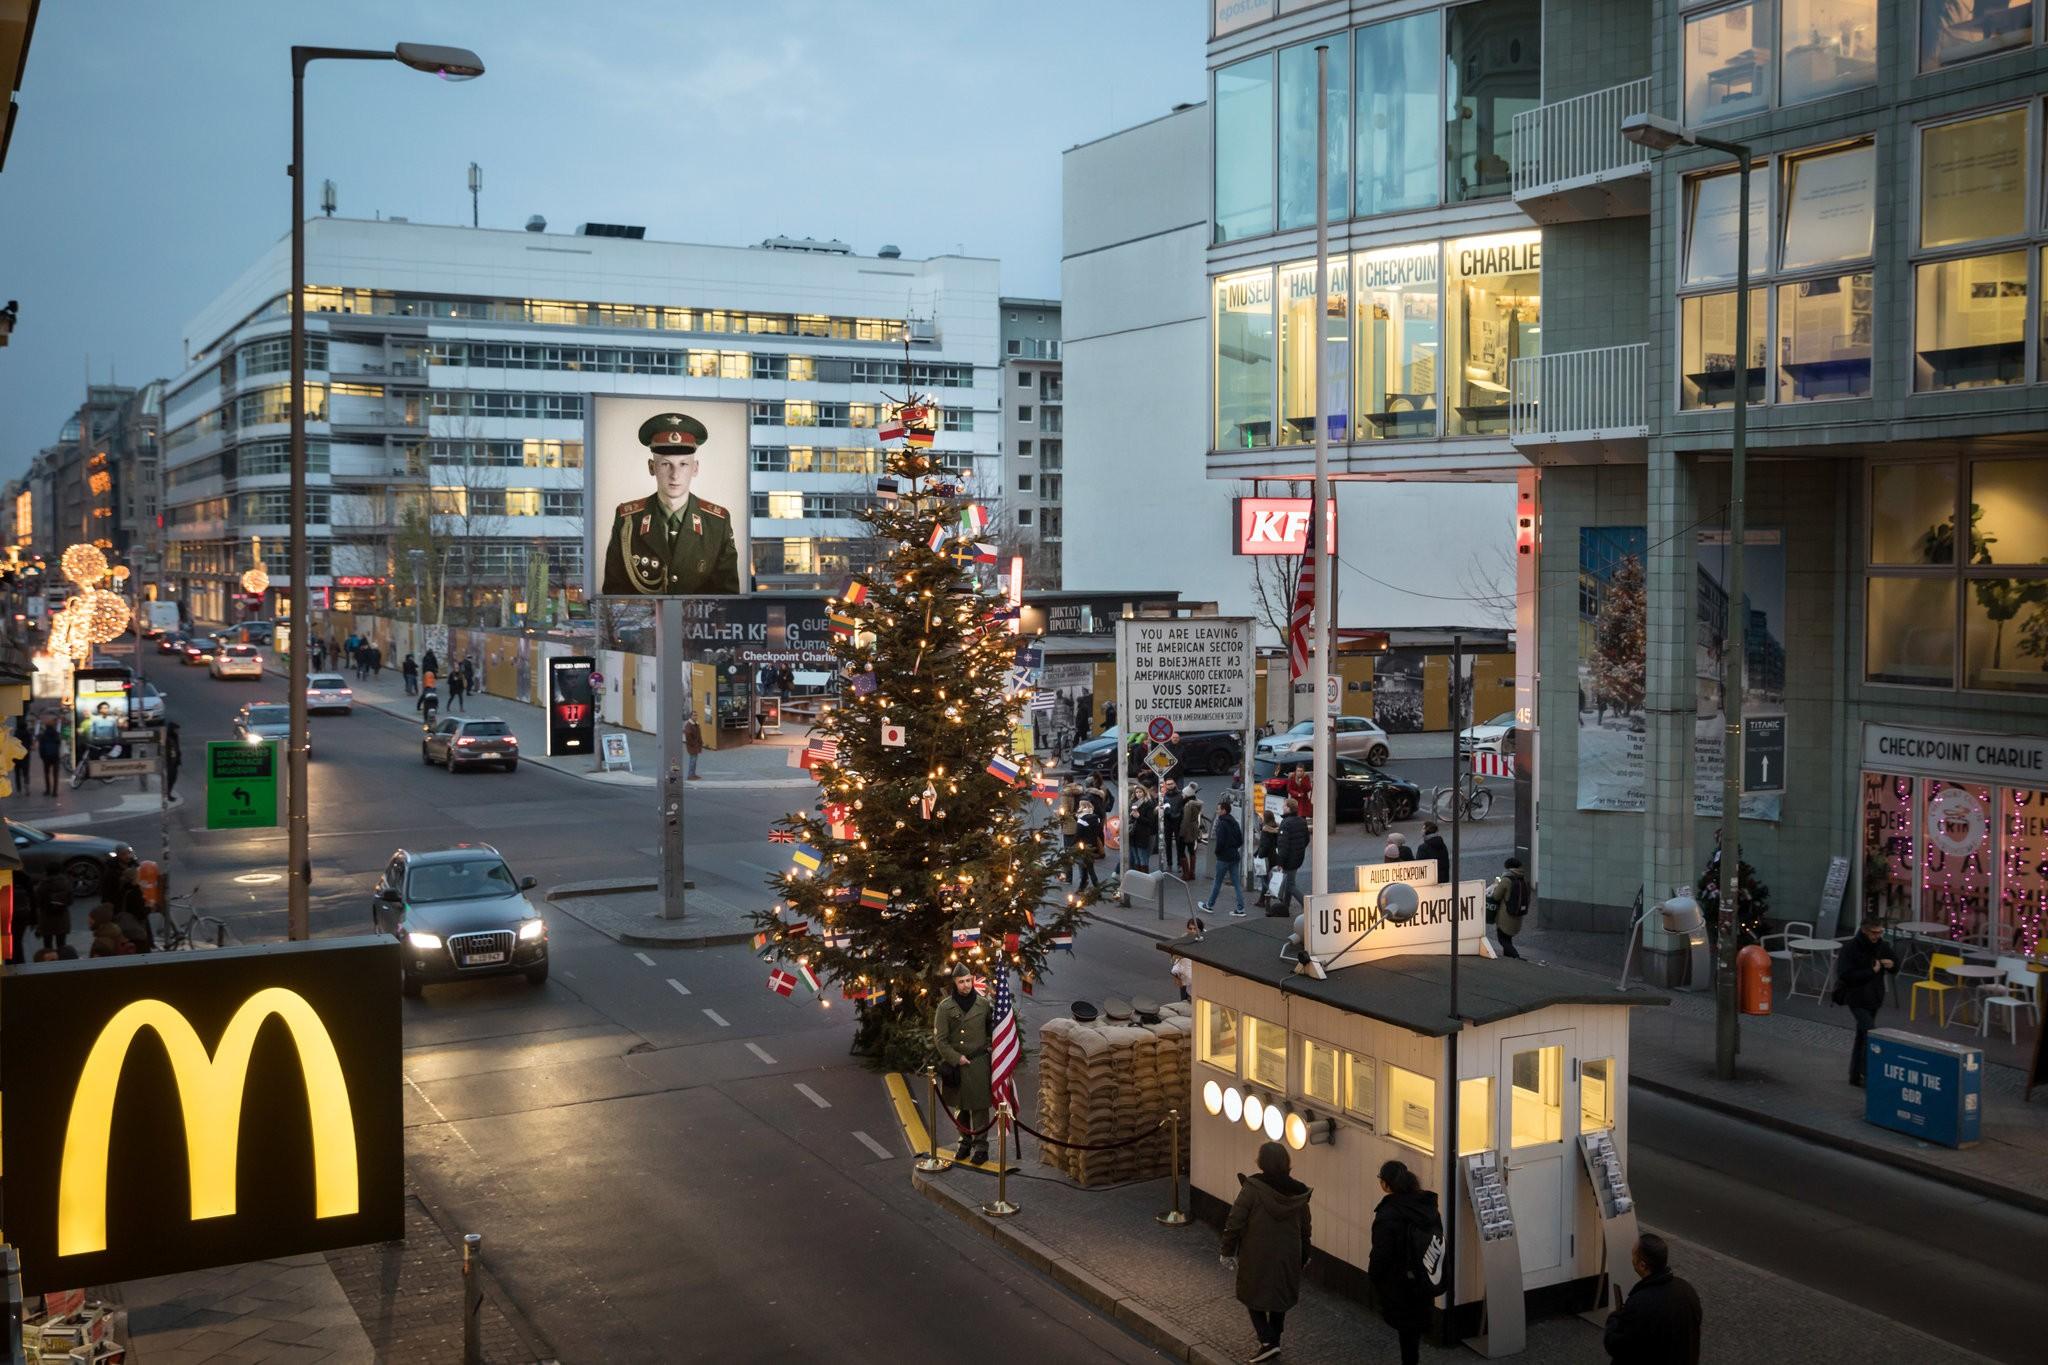 Berlin's historic Checkpoint Charlie under threat.